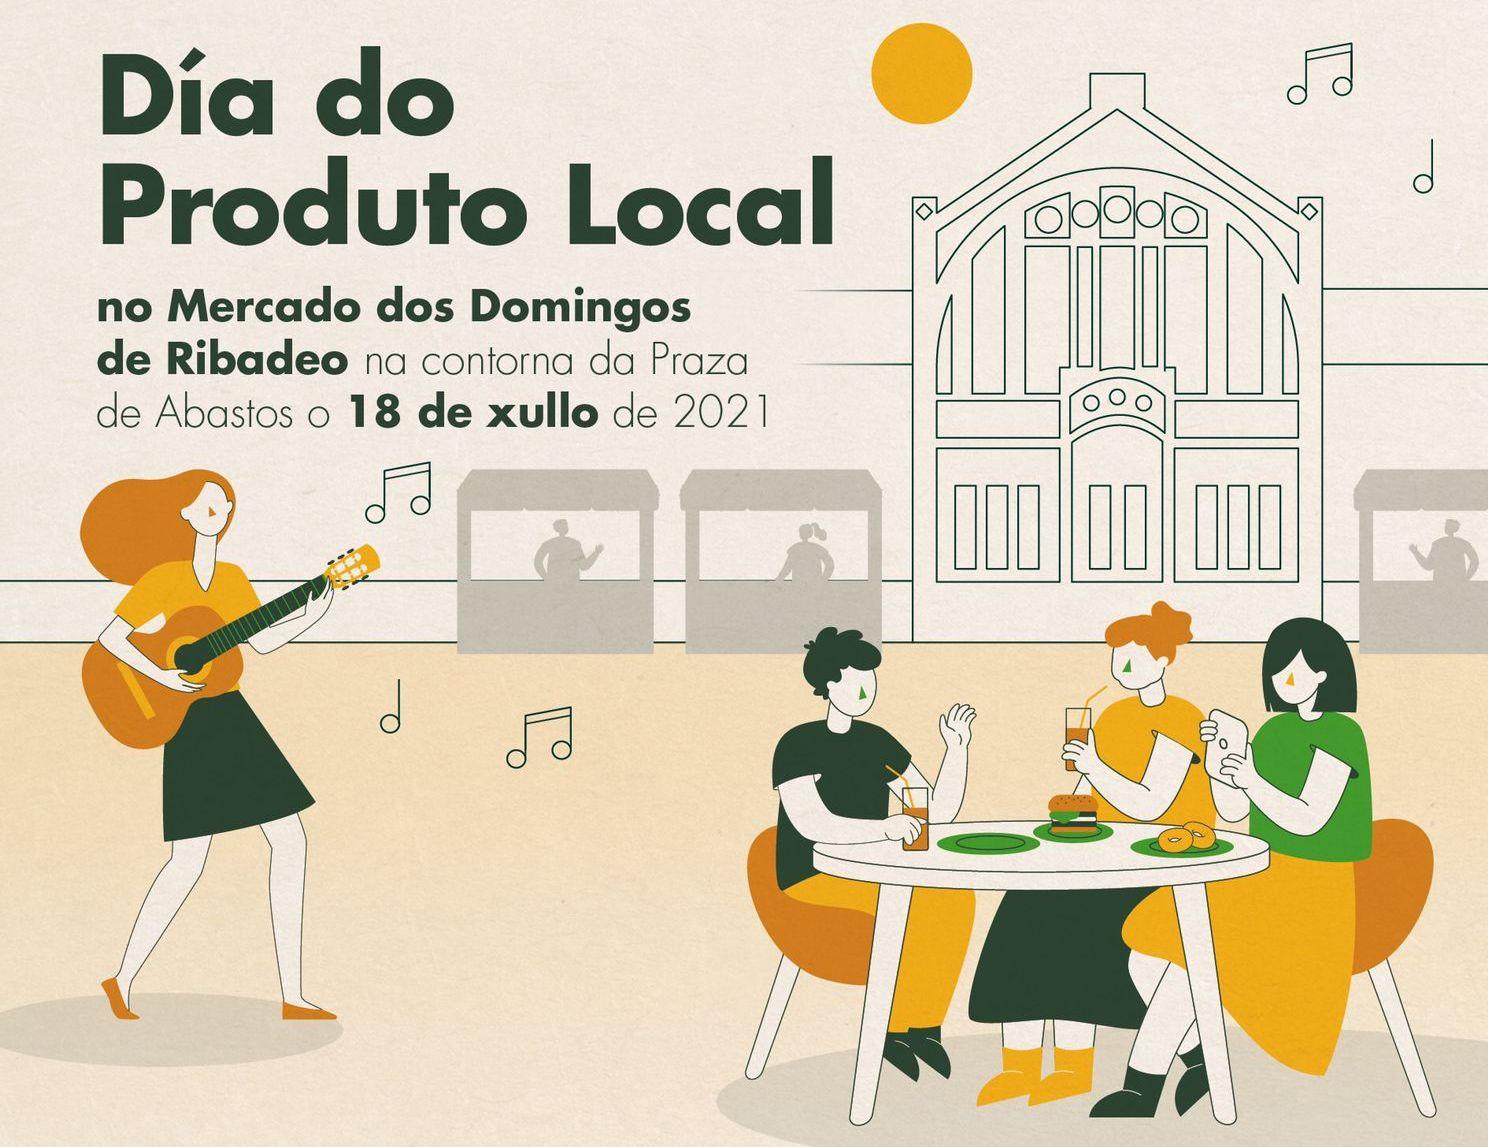 Ribadeo celebra este domingo o Día do produto local